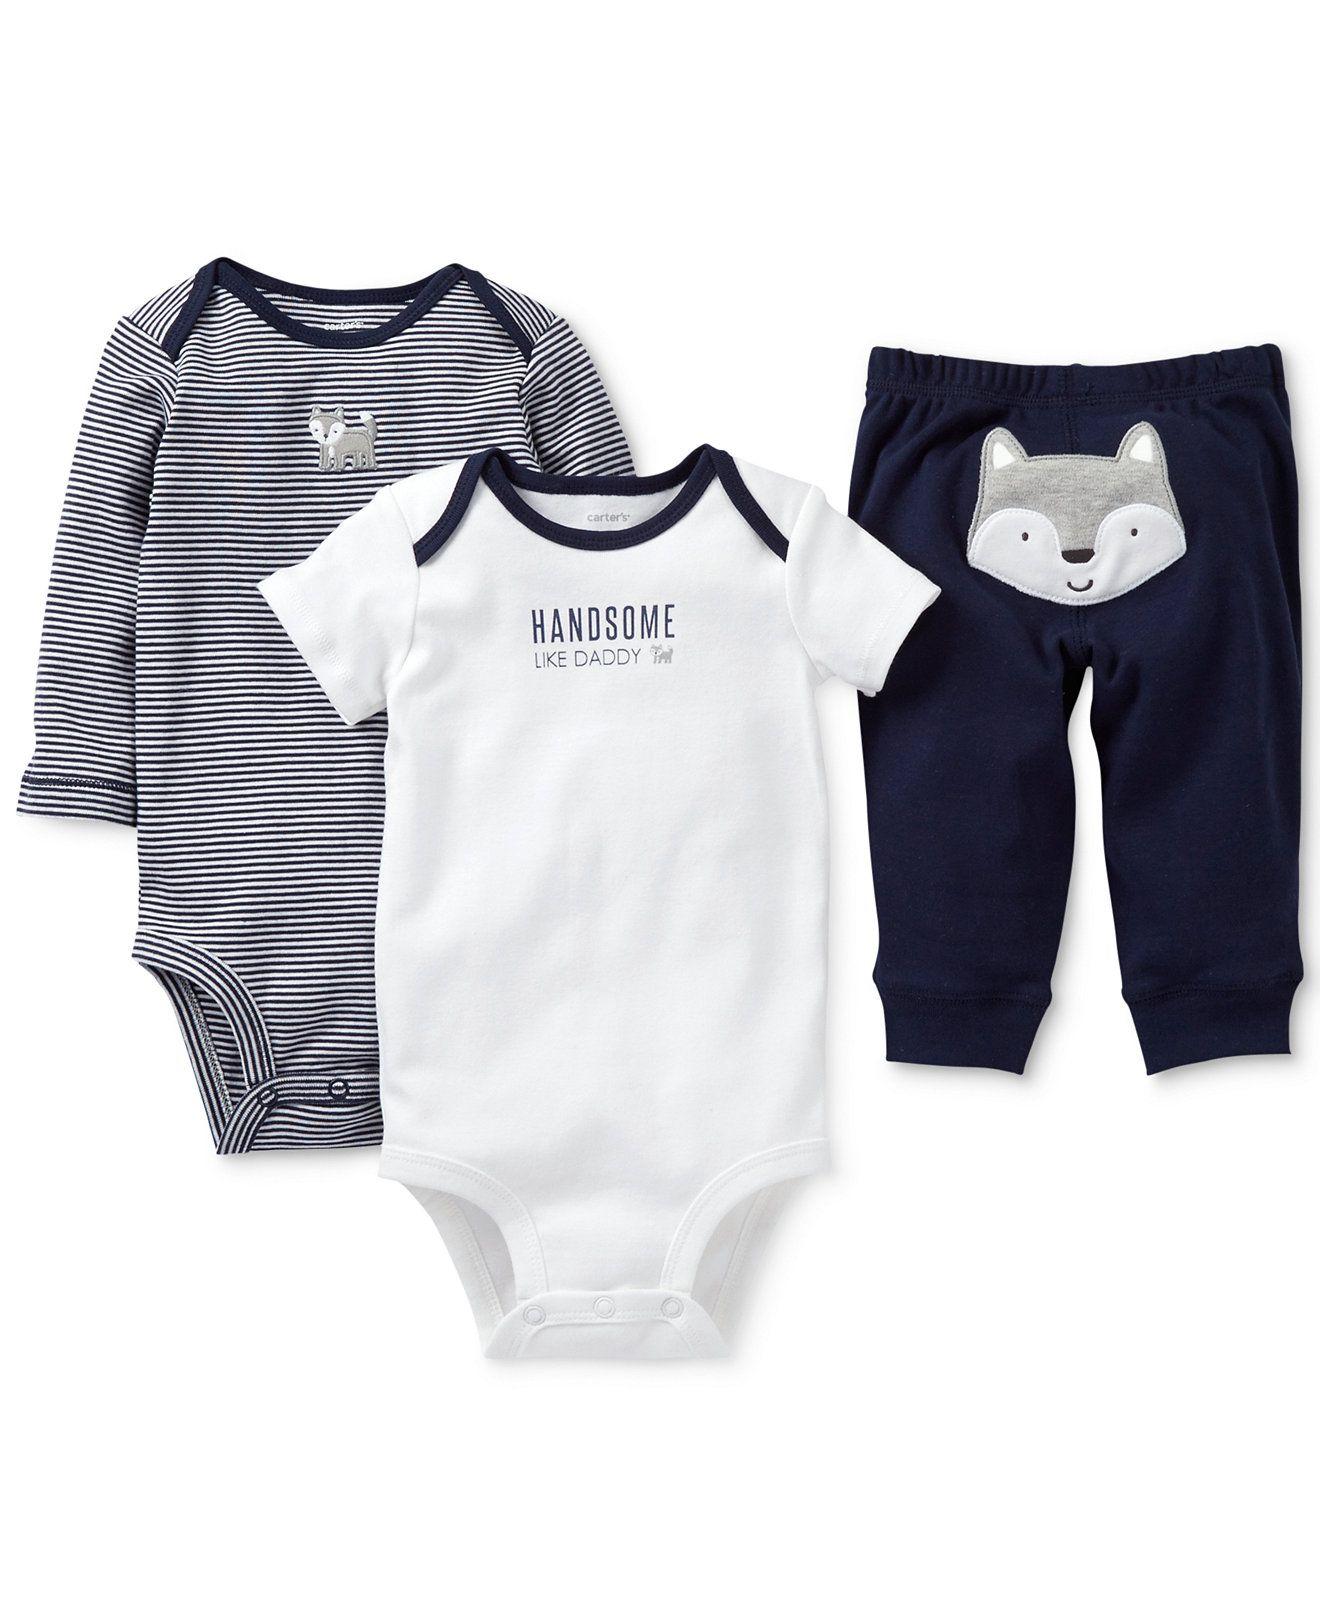 Carter's Baby Boys' 3-Piece Wolf Bodysuits & Pants Set - Kids Baby Boy (0-24 months) - Macy's